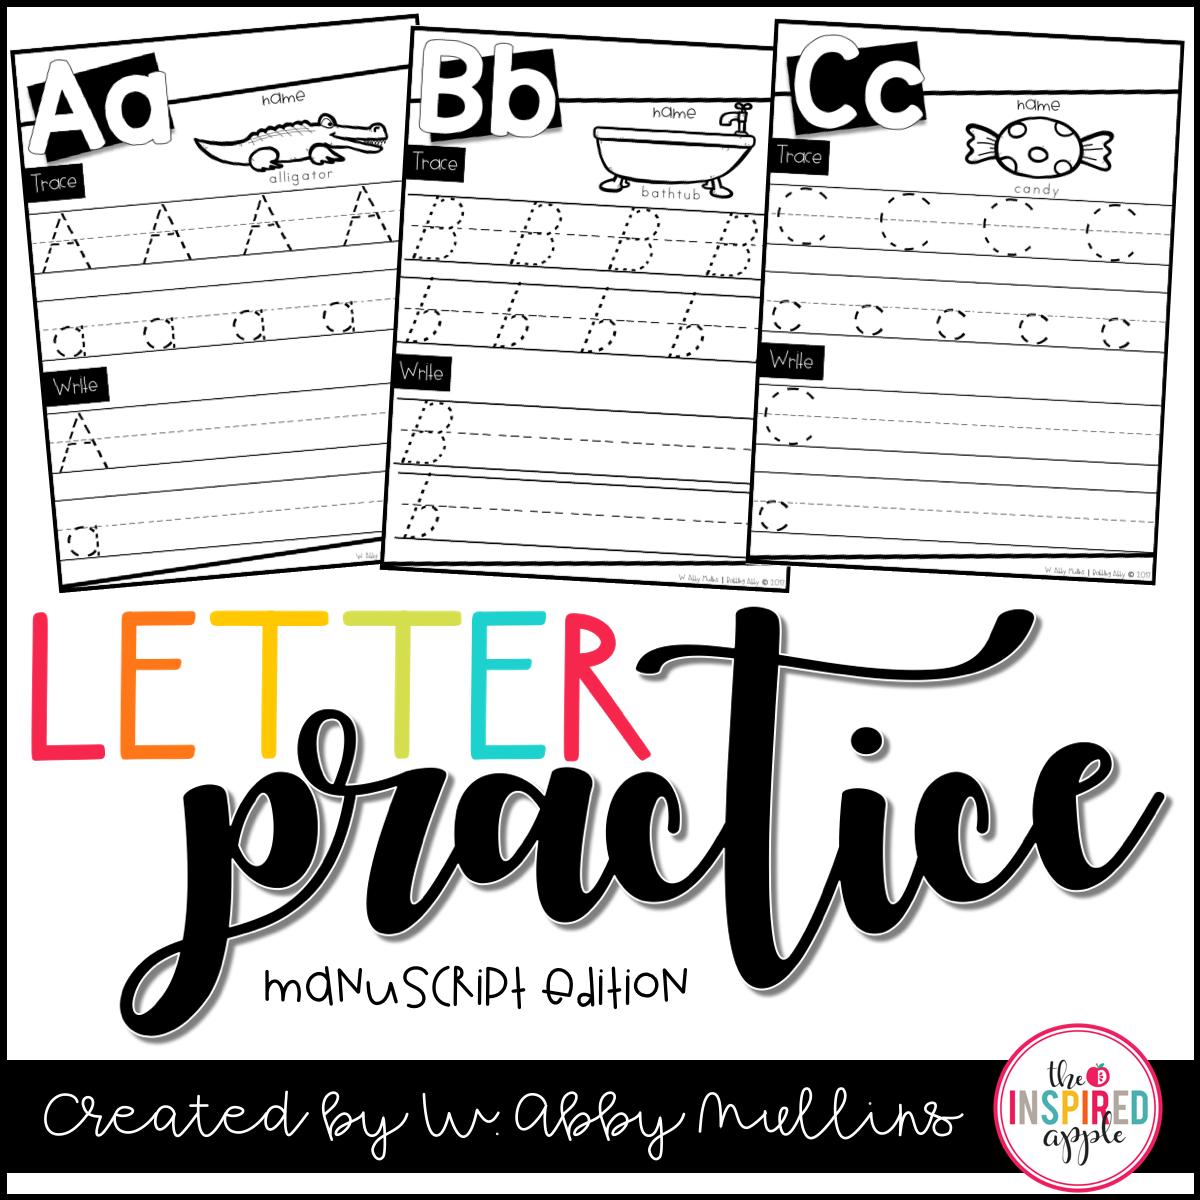 Free Letter Practice Worksheets